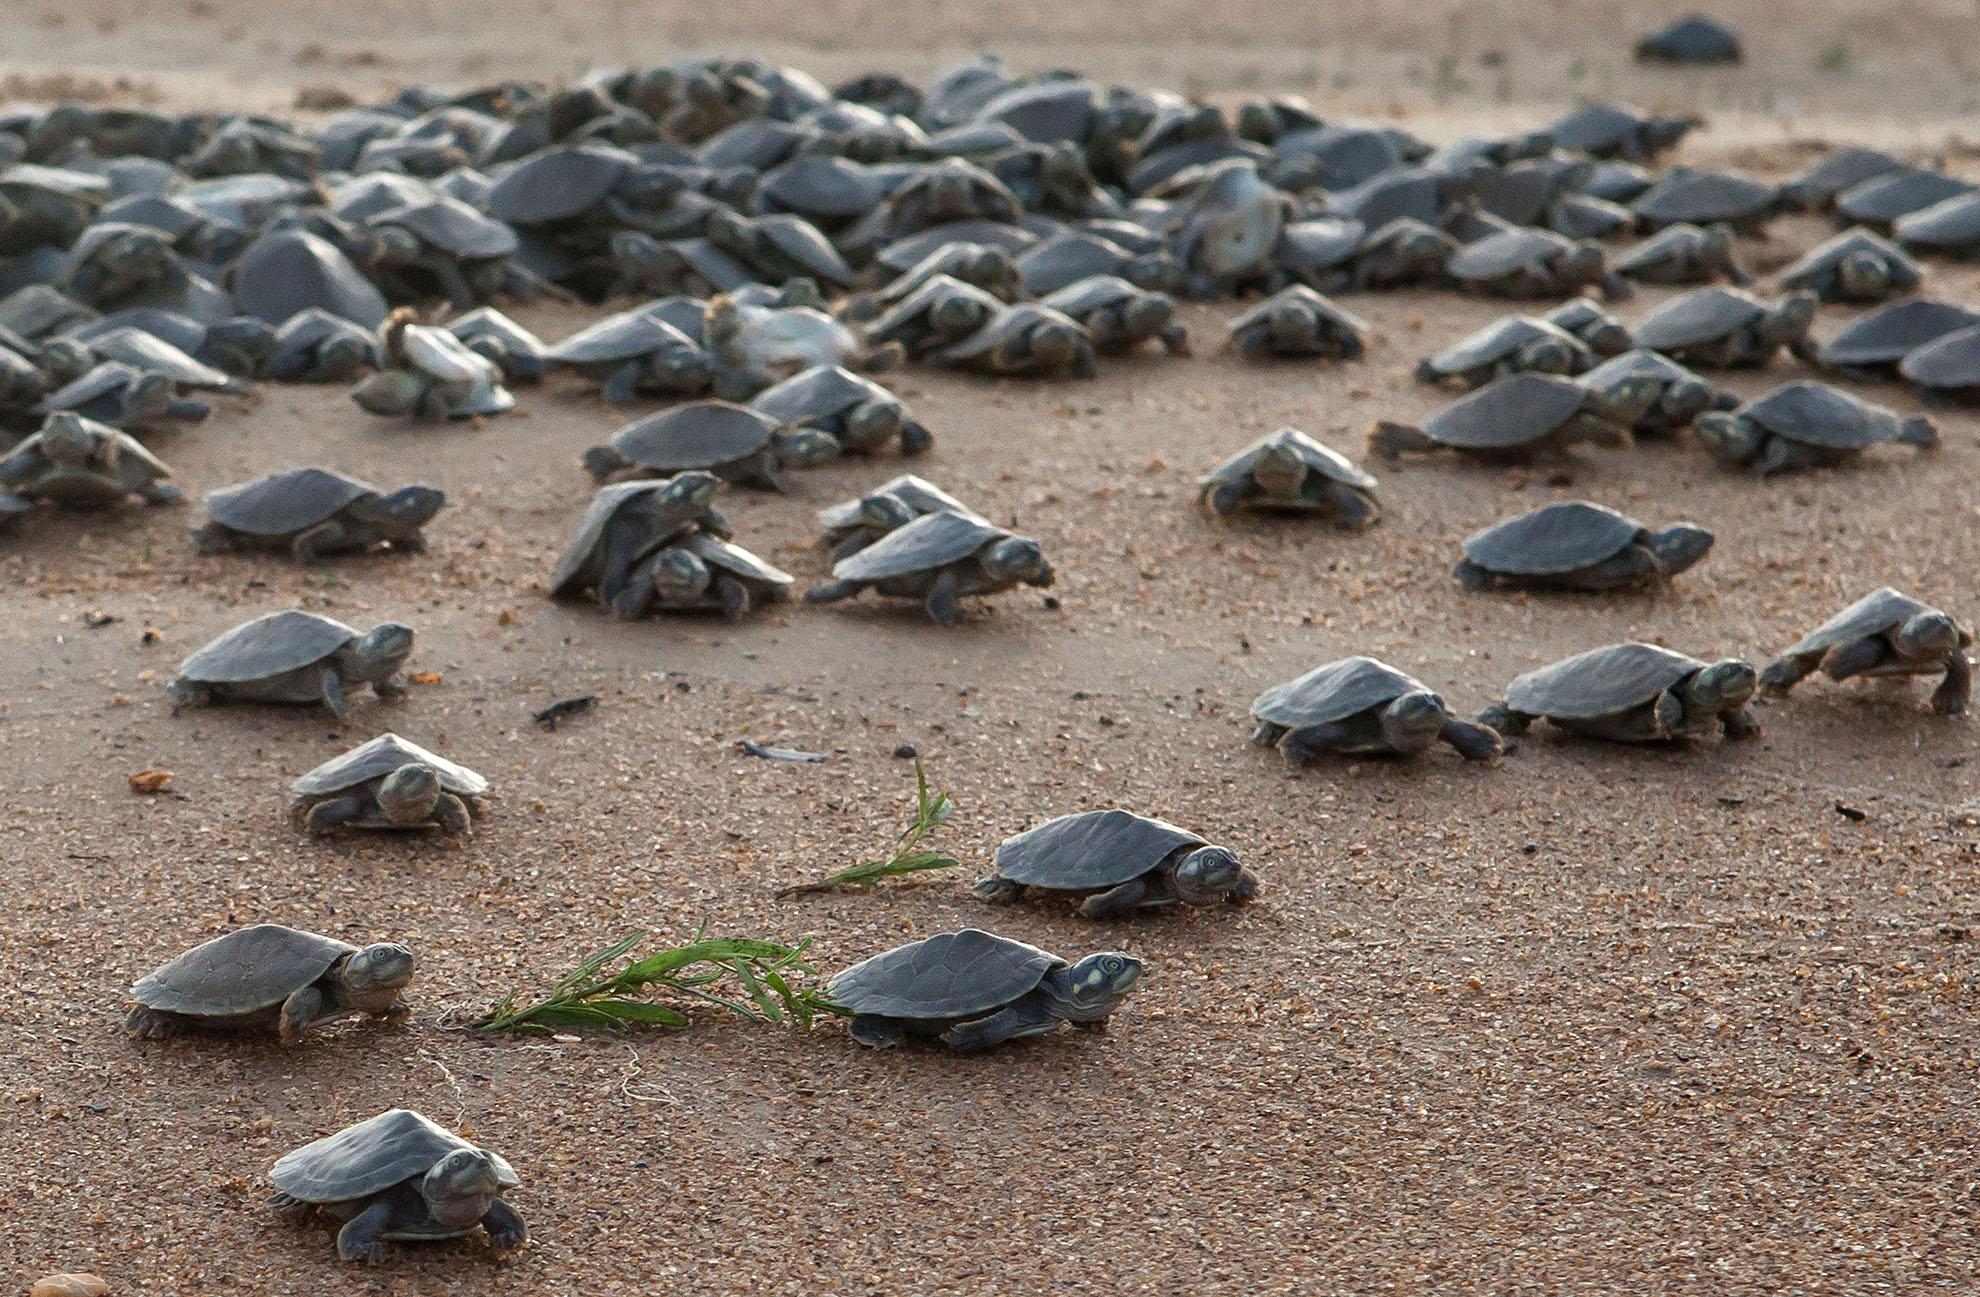 Protegendo a tartaruga-da-amazônia